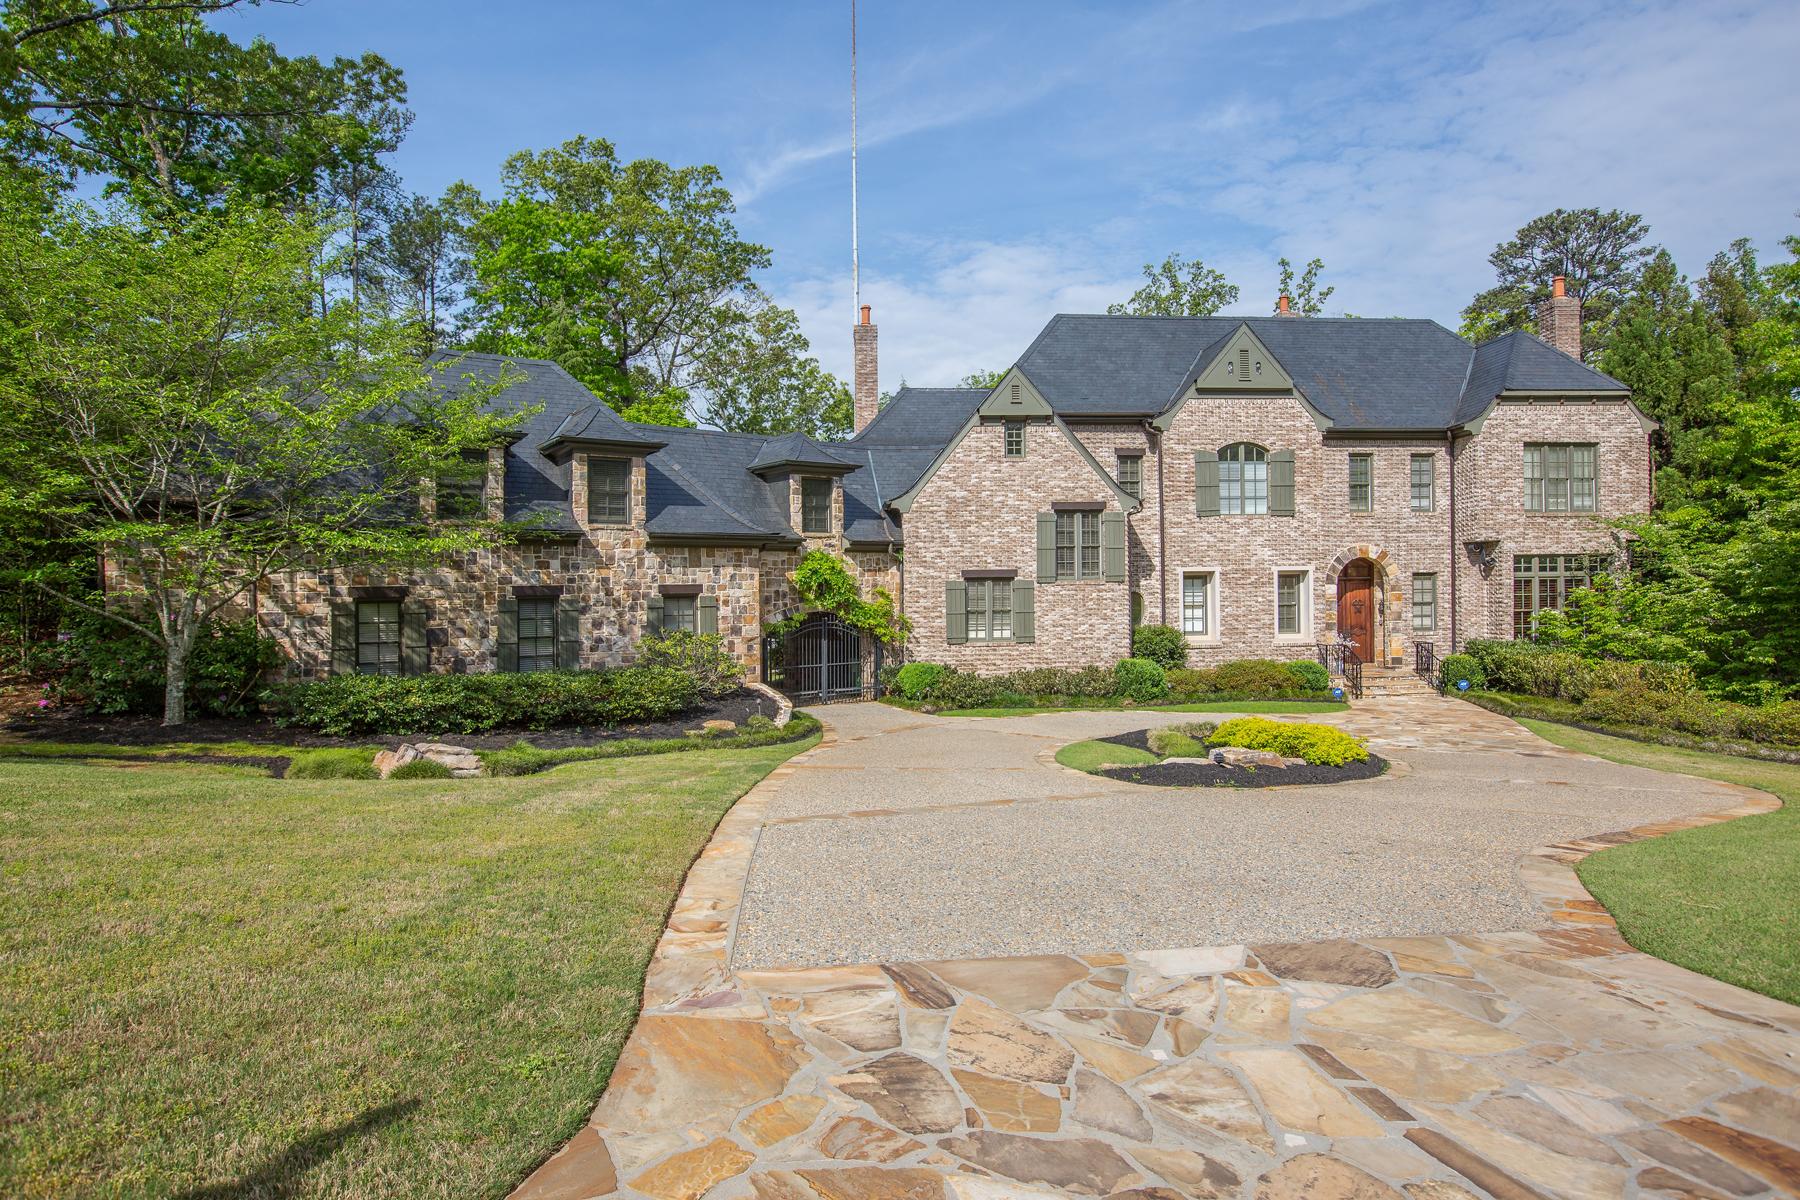 獨棟家庭住宅 為 出售 在 Gated Brick And Stone Home 4240 Irma Court Buckhead, Atlanta, 喬治亞州, 30327 美國